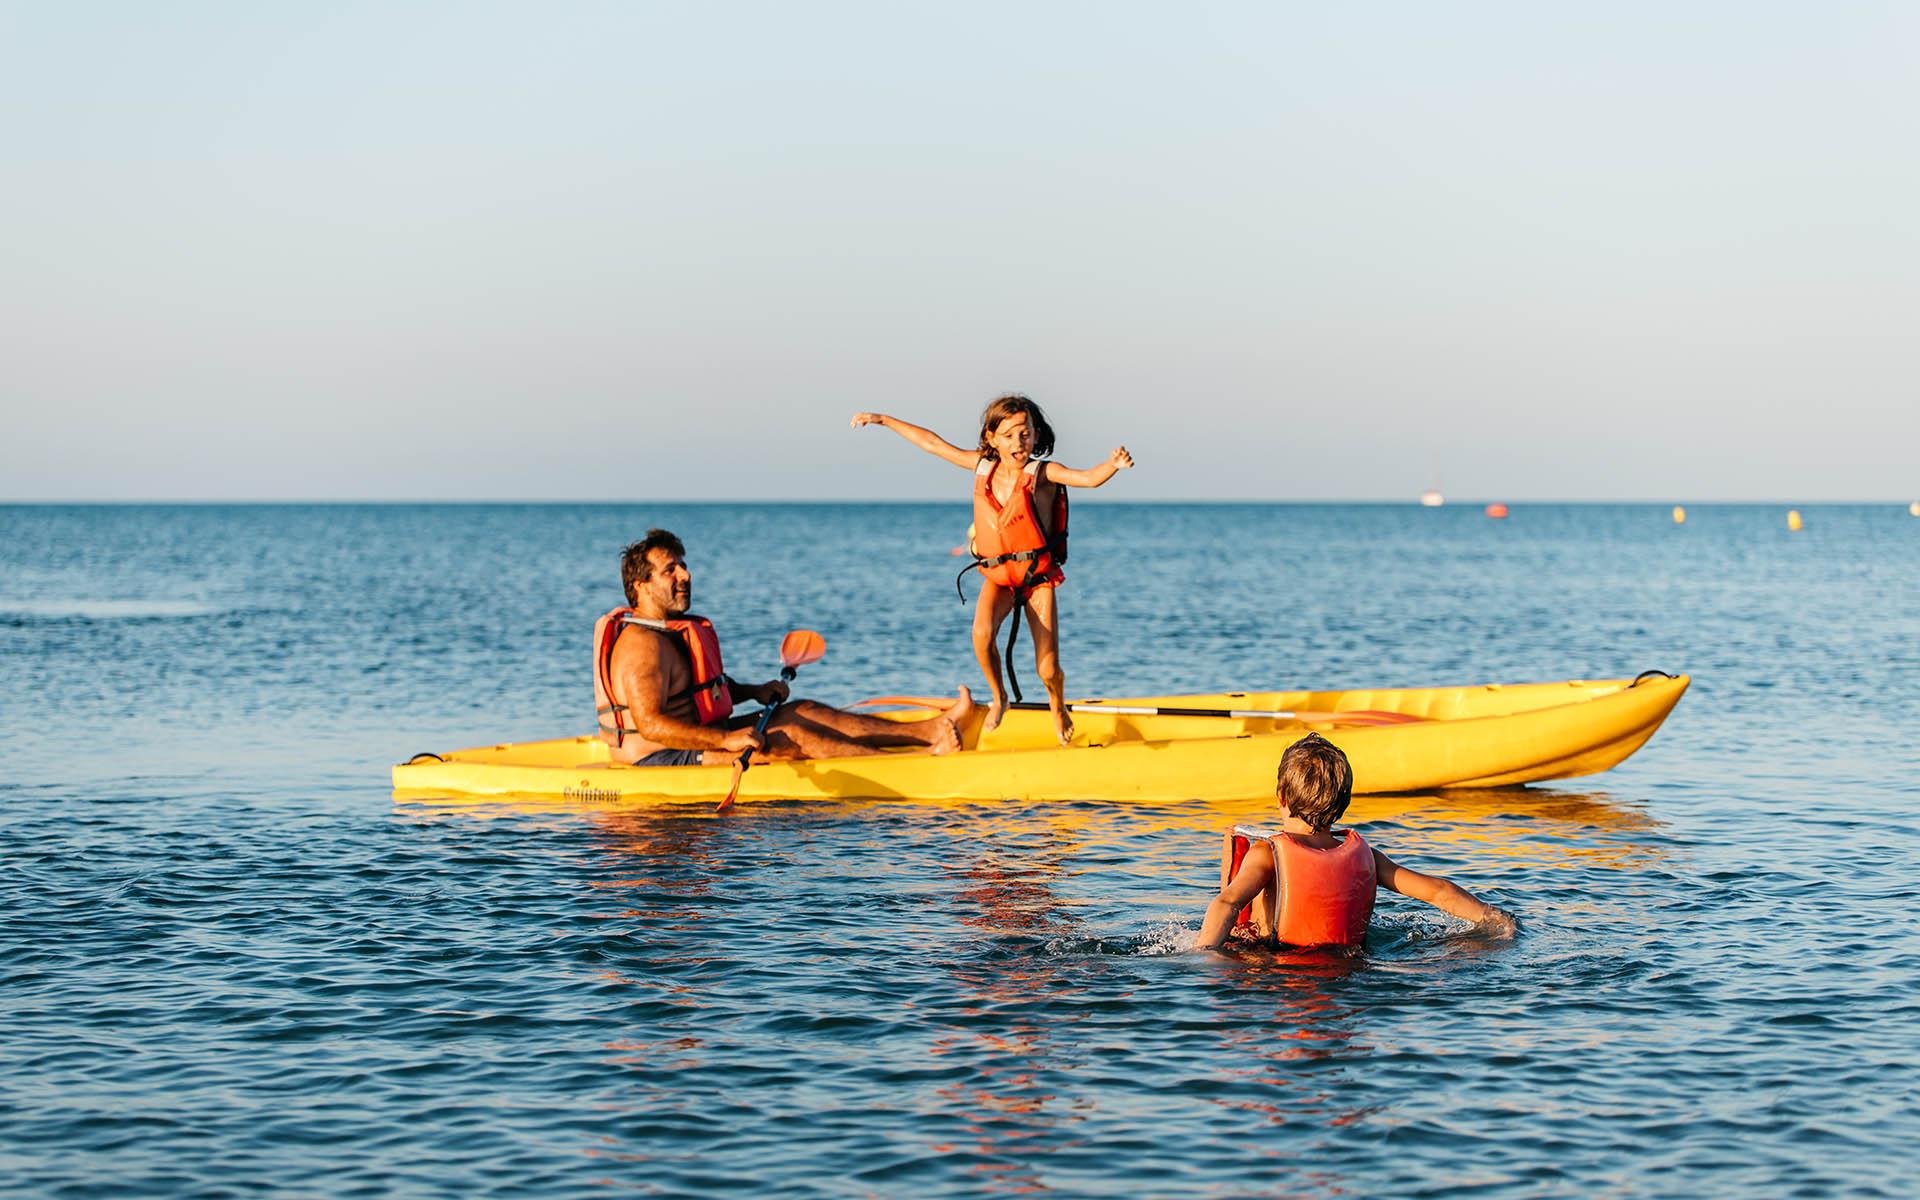 Libertad, silencio, paz, naturaleza... El placer de navegar en kayak de mar